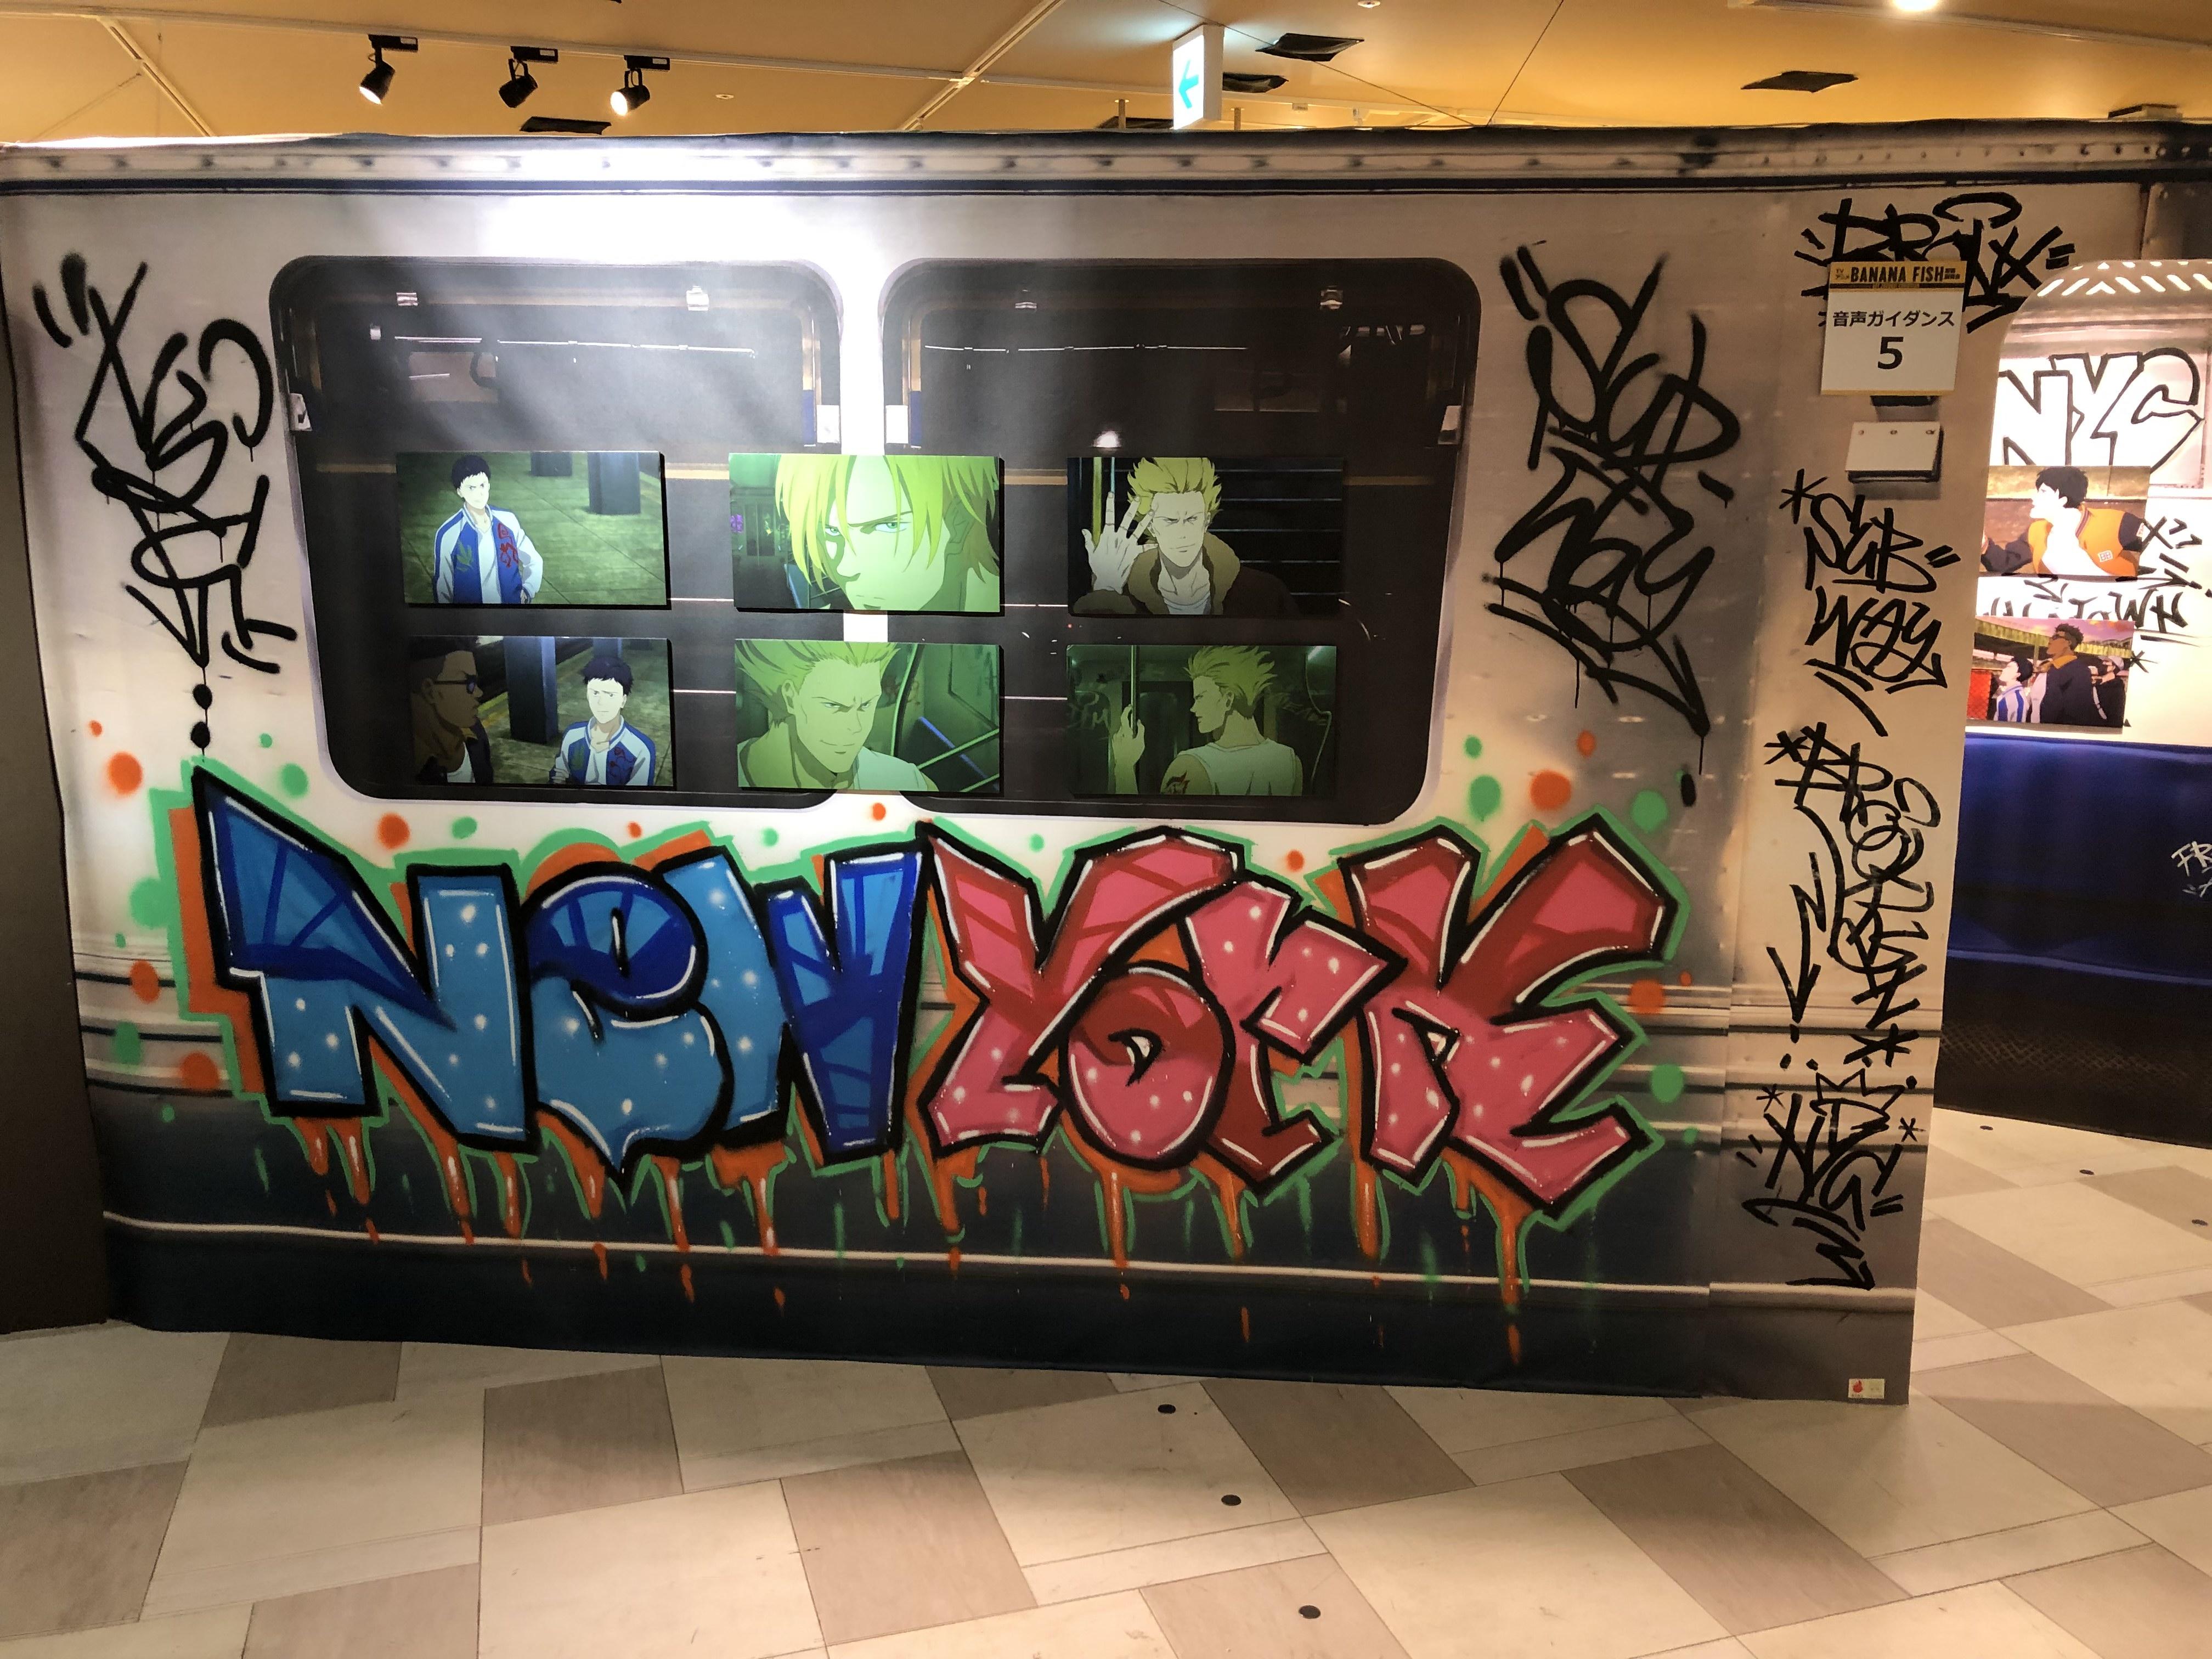 TVアニメ 【BANANA FISH】原画展 空間演出:Subway